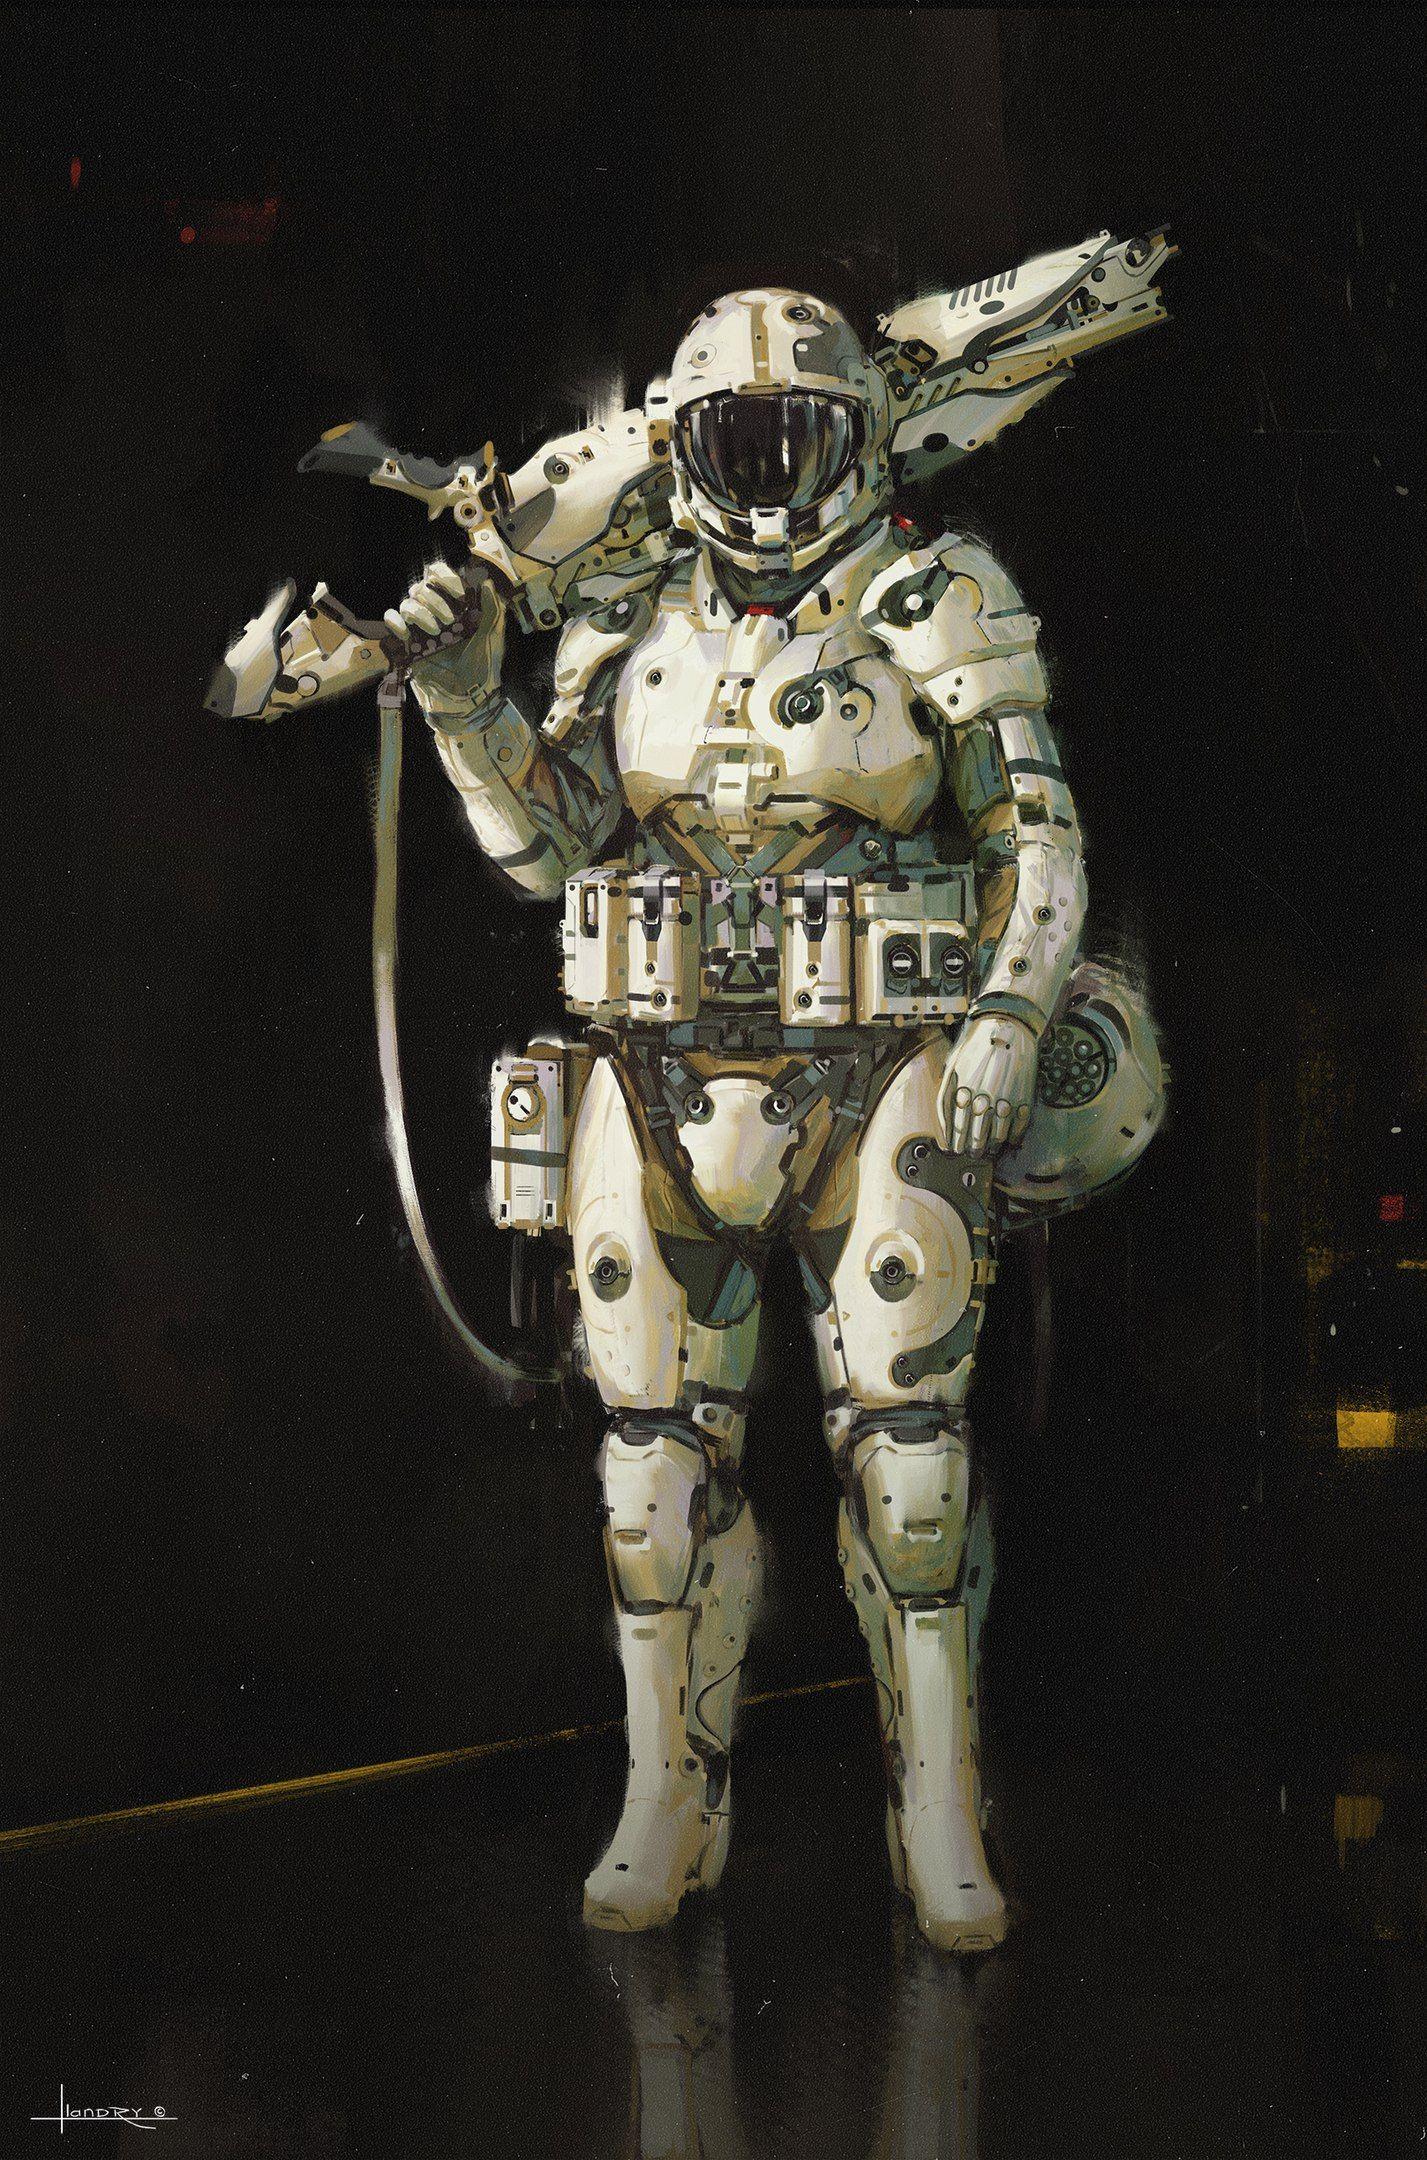 григорий власенко tech forever pinterest sci fi characters